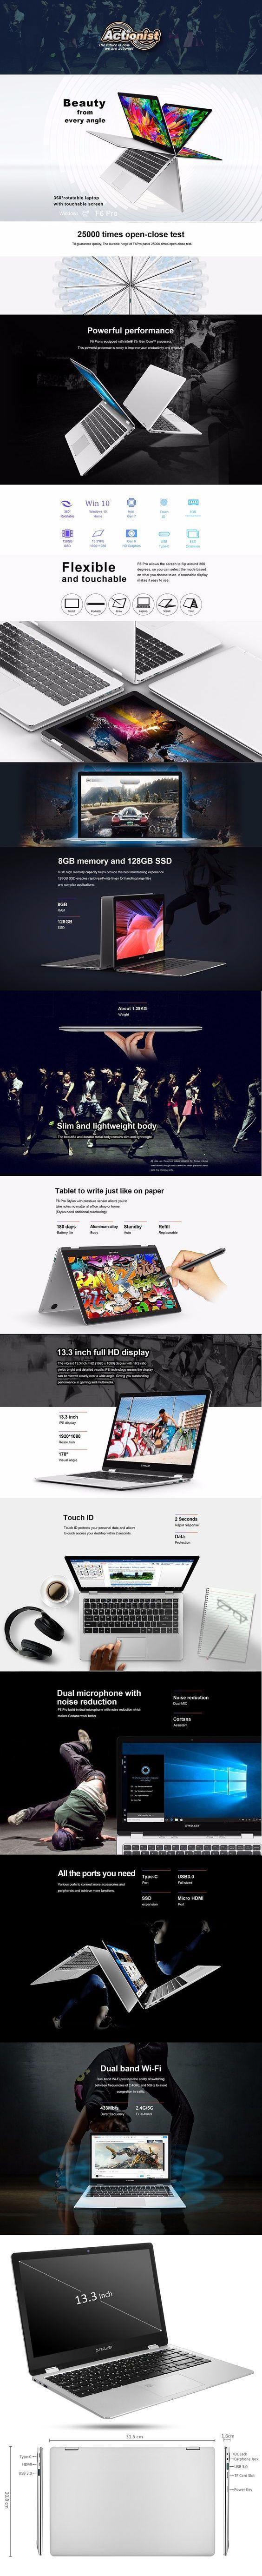 Teclast F6 Pro Notebook Fingerprint Recognition  -  SILVER